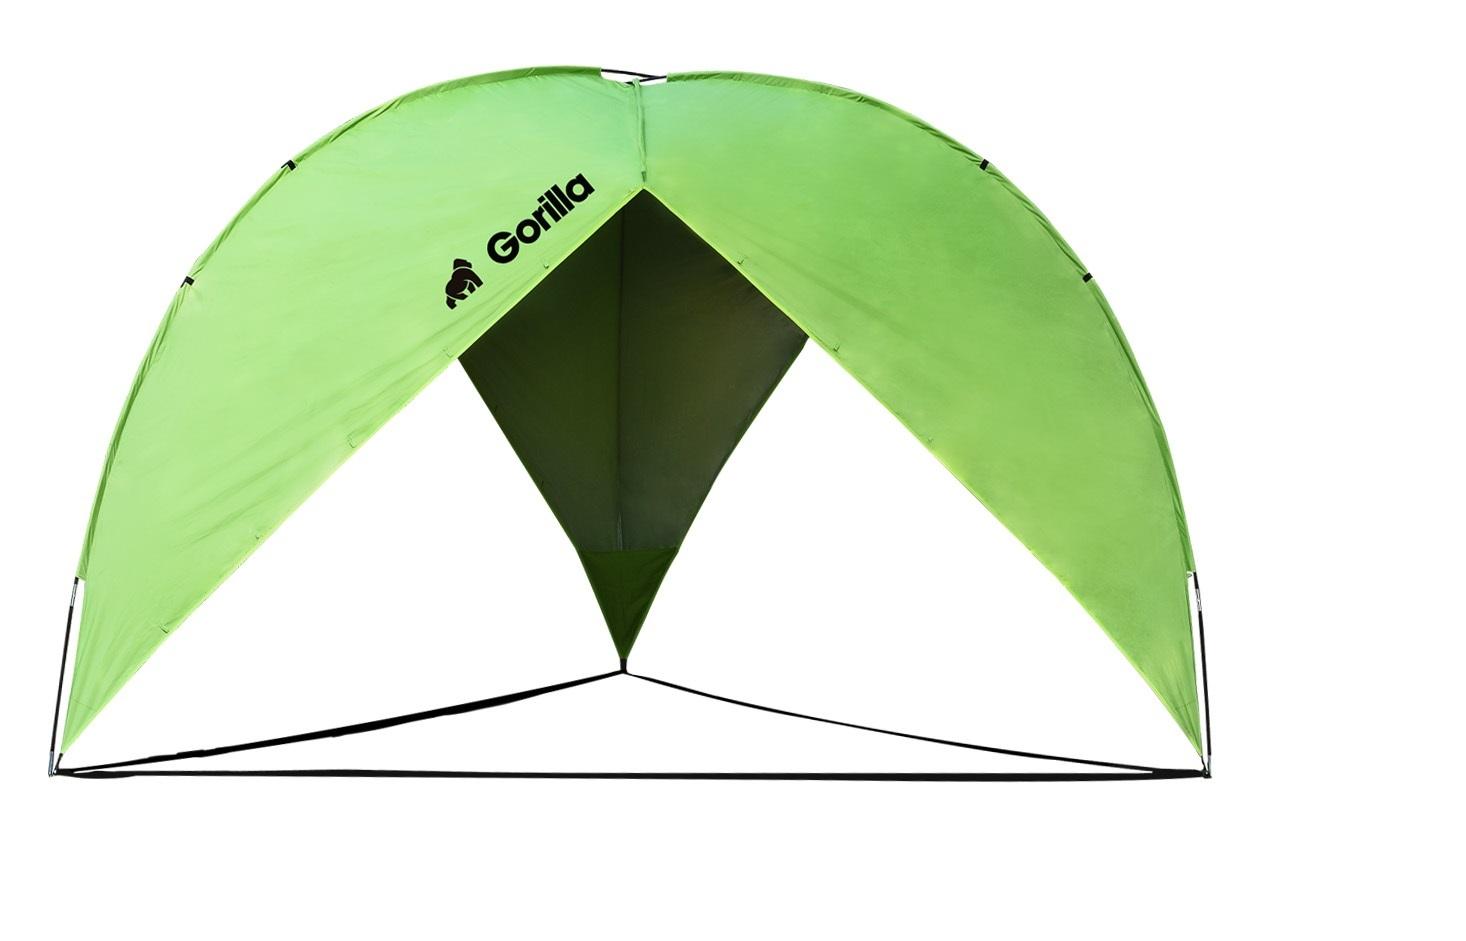 Big Triangle Beach & Sun Shade Shelter (380x380x230cm) | Green image